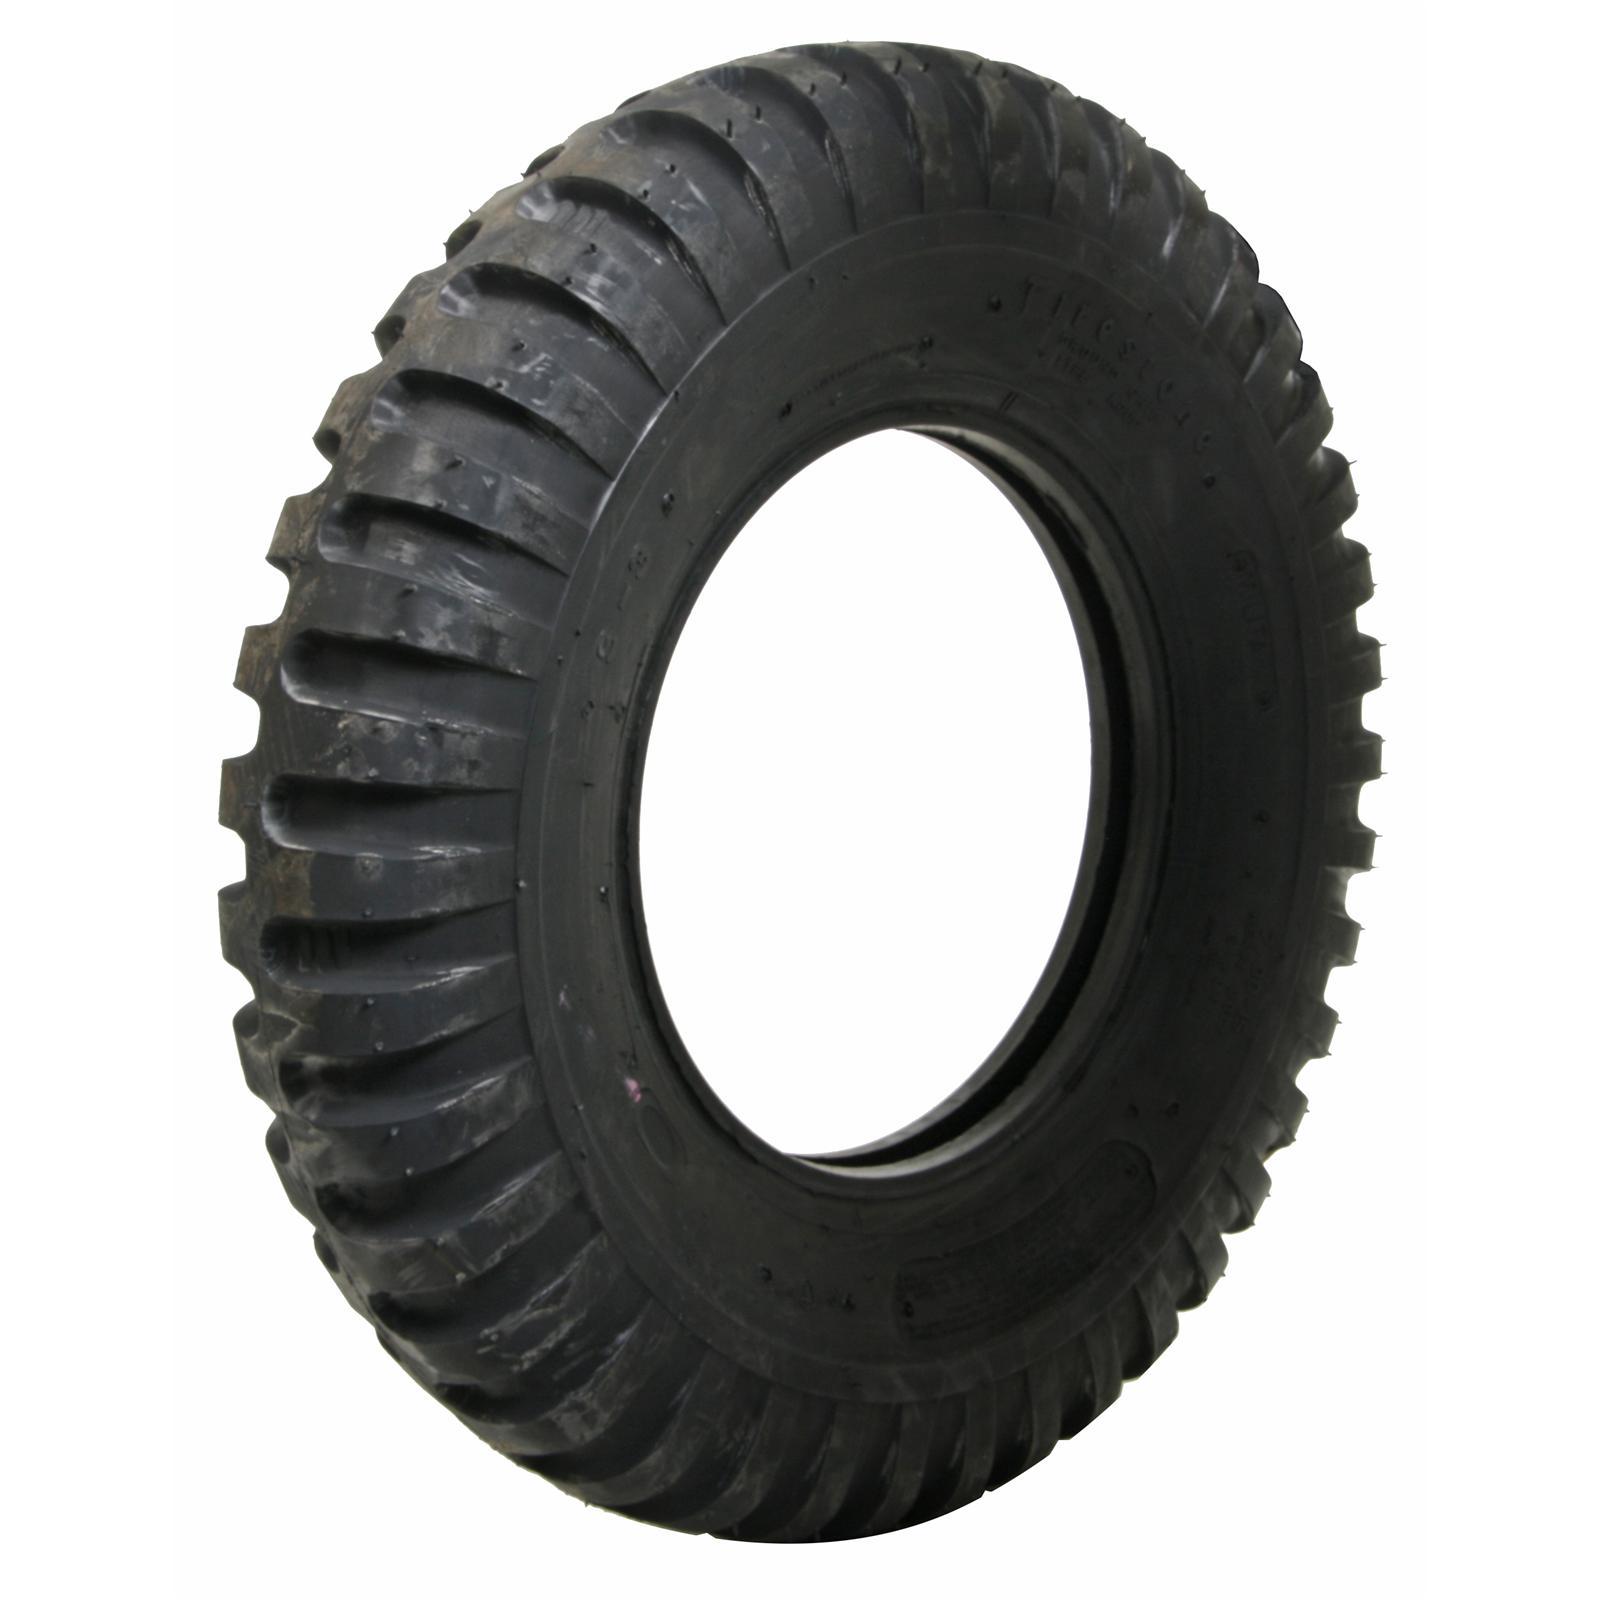 Set of 4 Coker Firestone Military Tires 7 00 15 Bias ply Blackwall